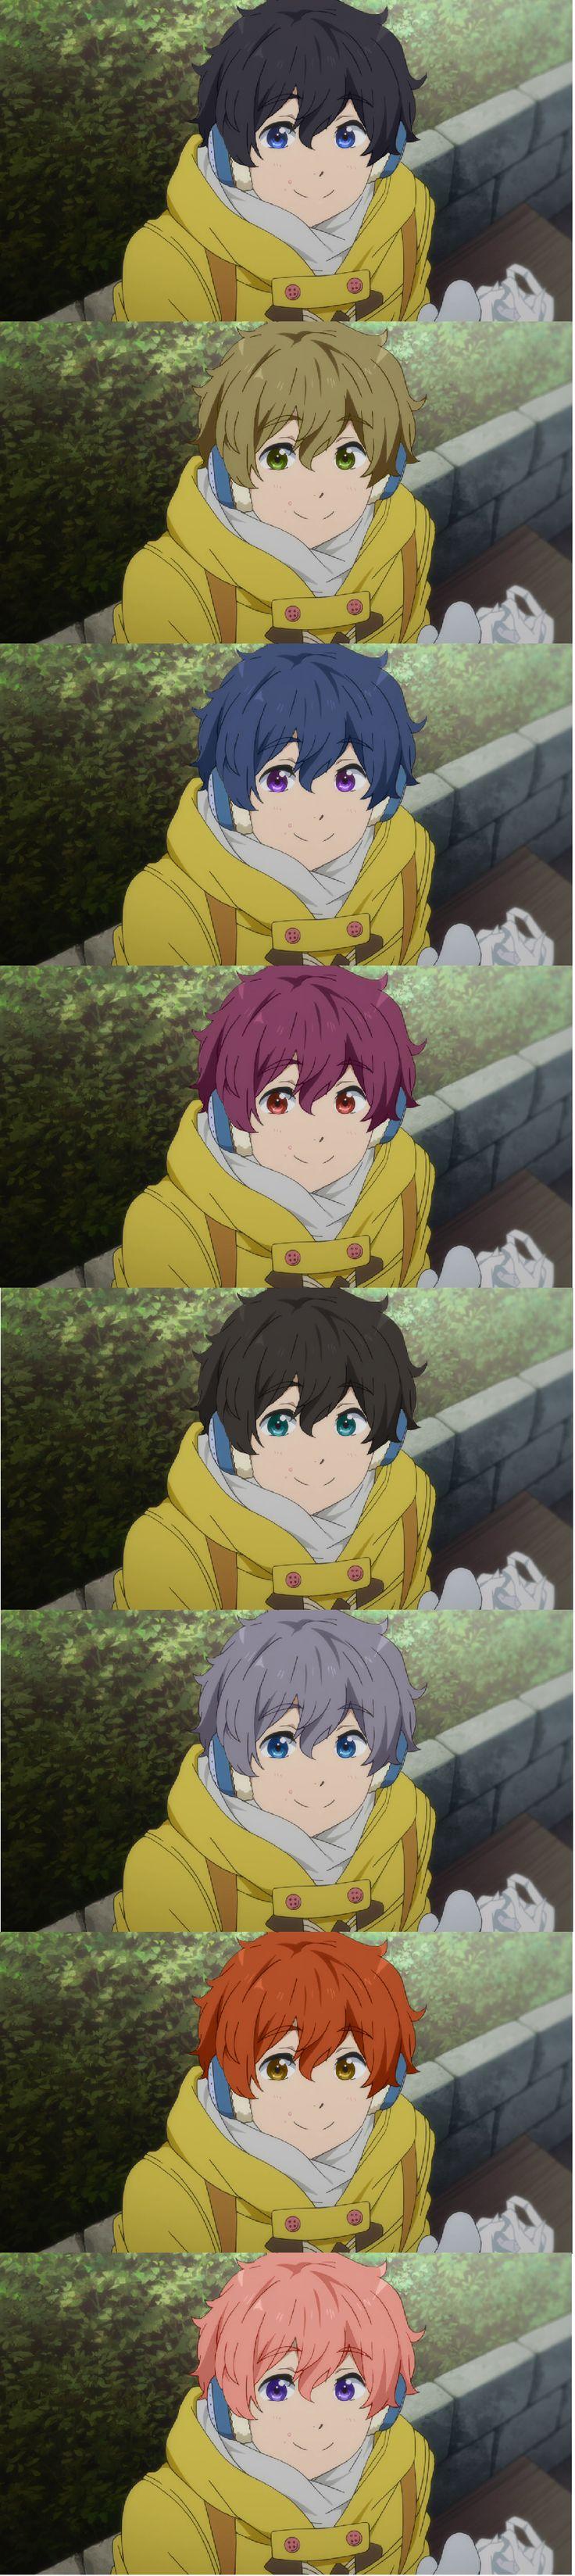 Hair Color Swap: Nagisa - The Kisumi one, tho... O.o>>the kisumione is so cute